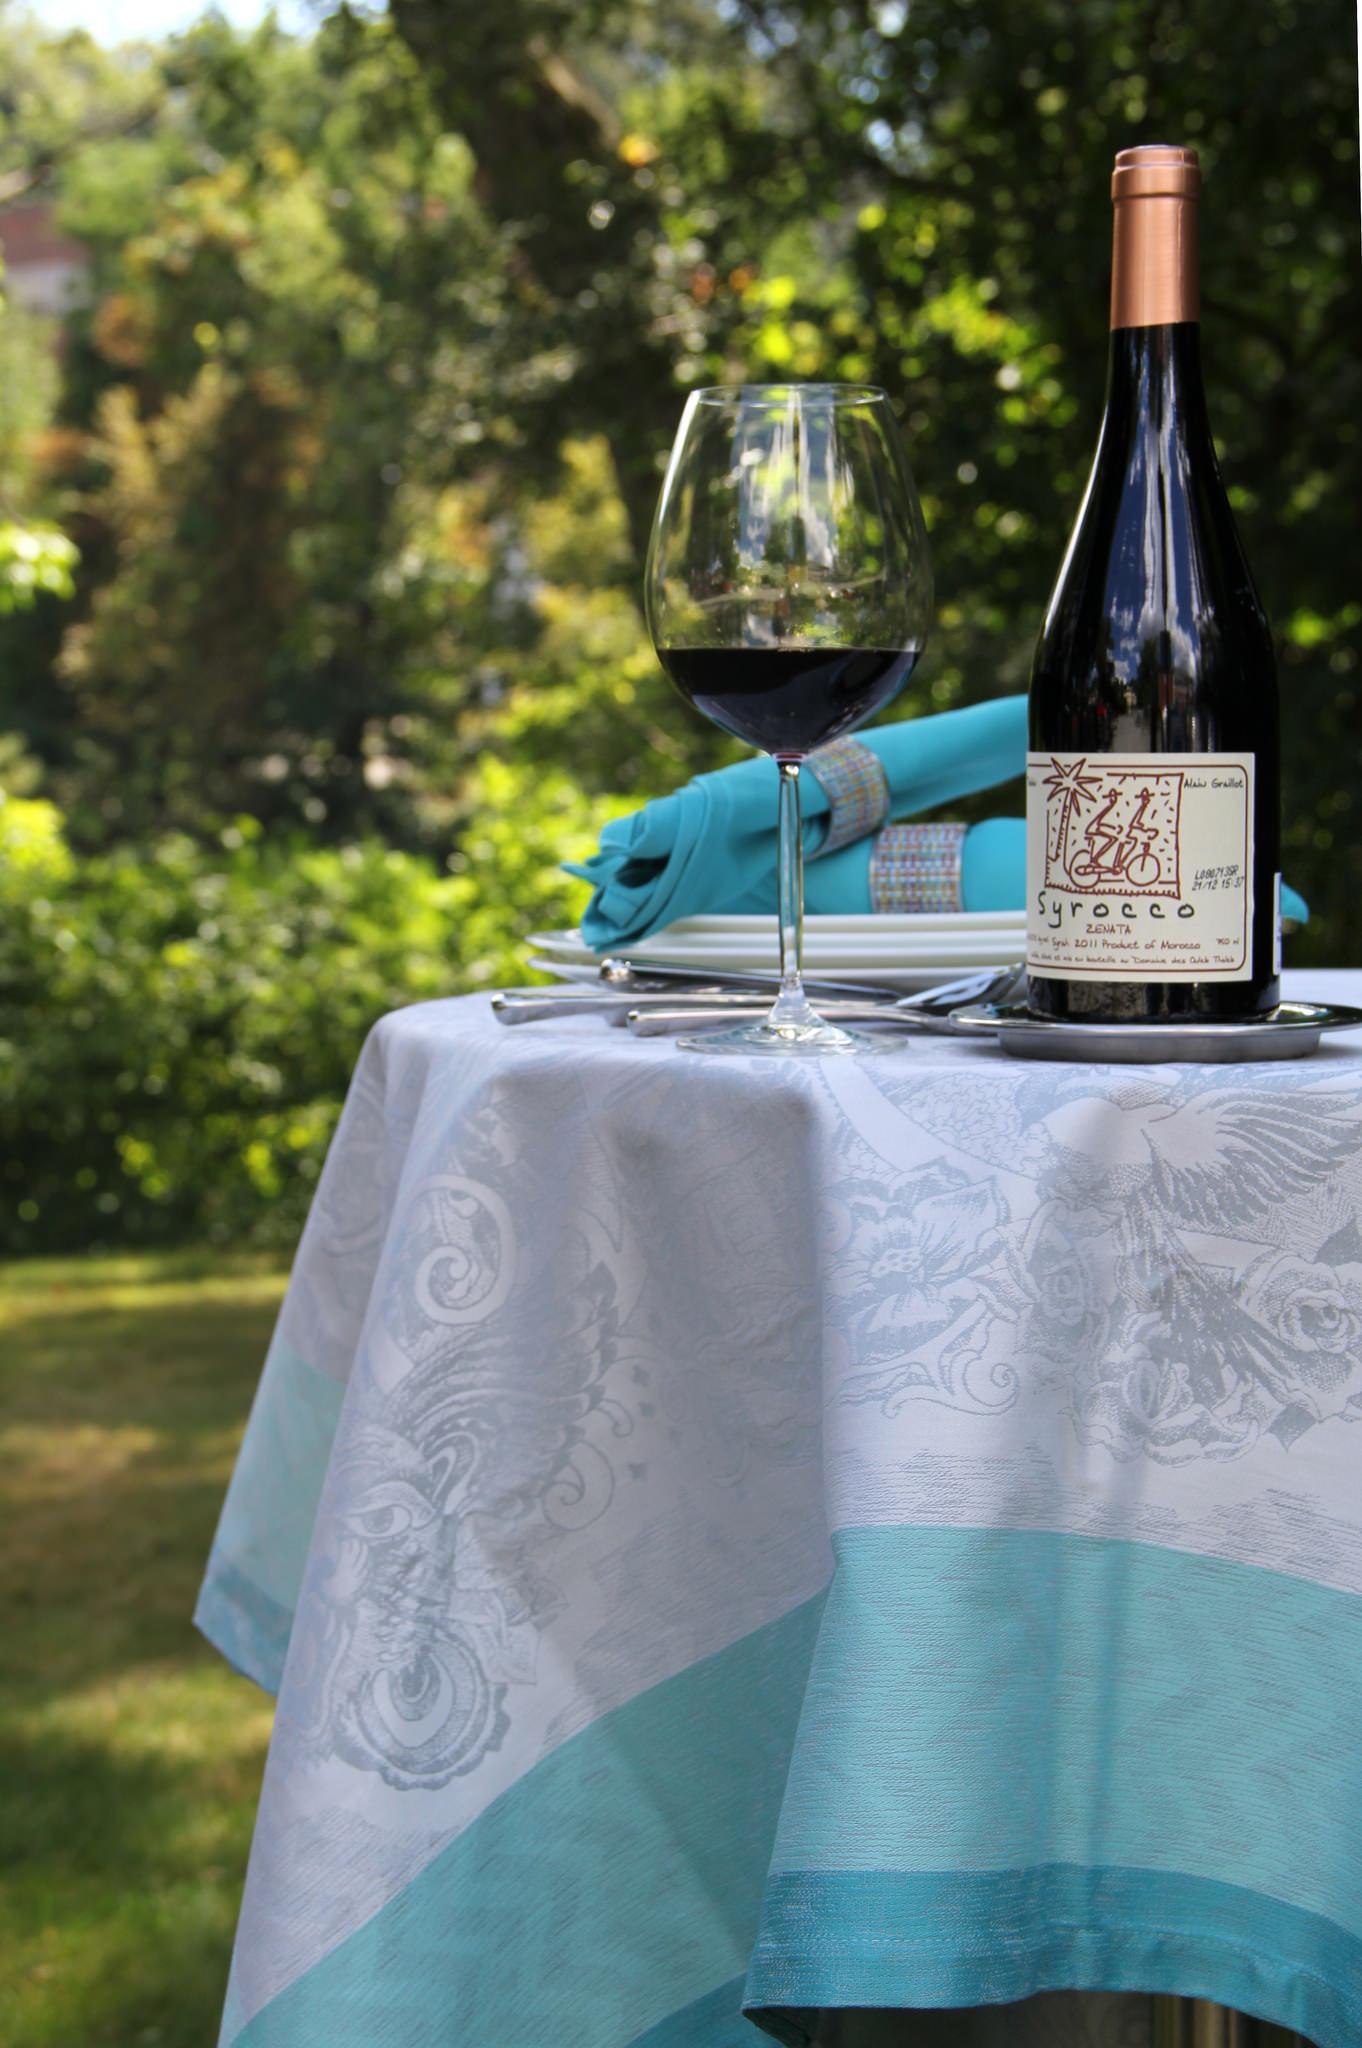 Schott Zwiesel Diva Living Burgundy glass , Garnier-Thiebaut Green Sweet tablecloth in  Mysterieuse Emeraude ,  Confettis napkins .